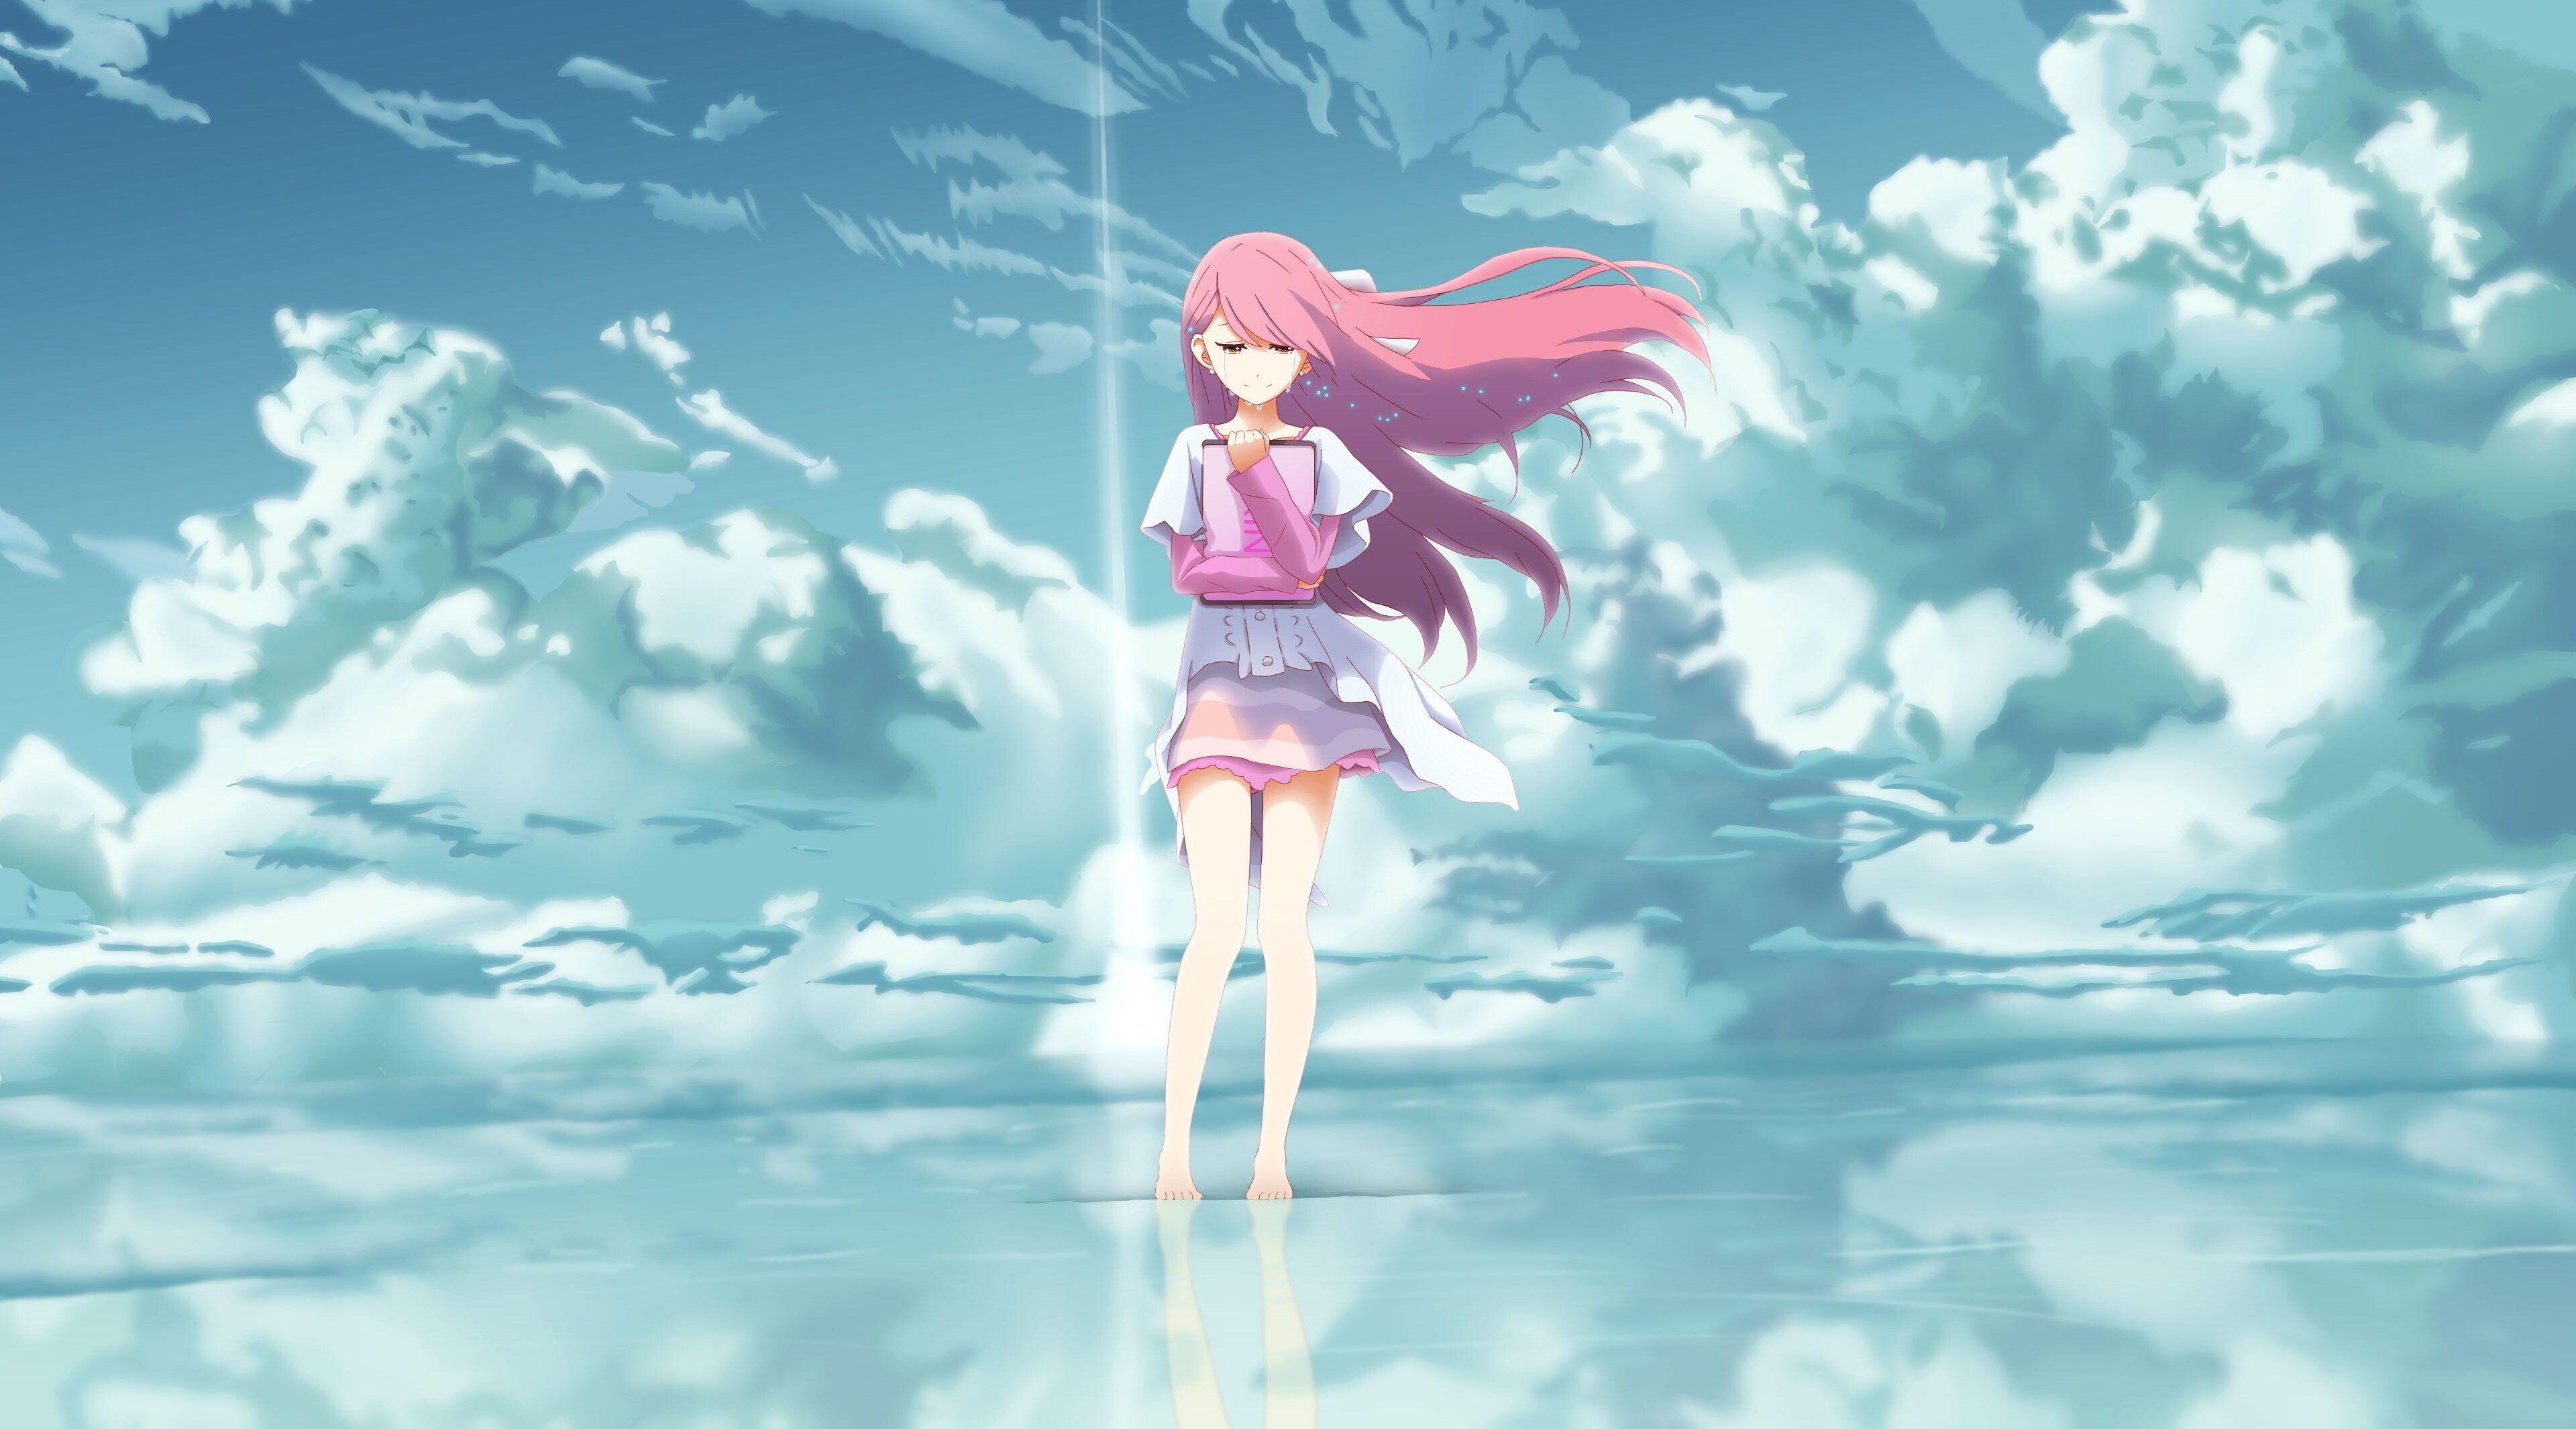 anime 4k best computer 4K wallpaper hdwallpaper